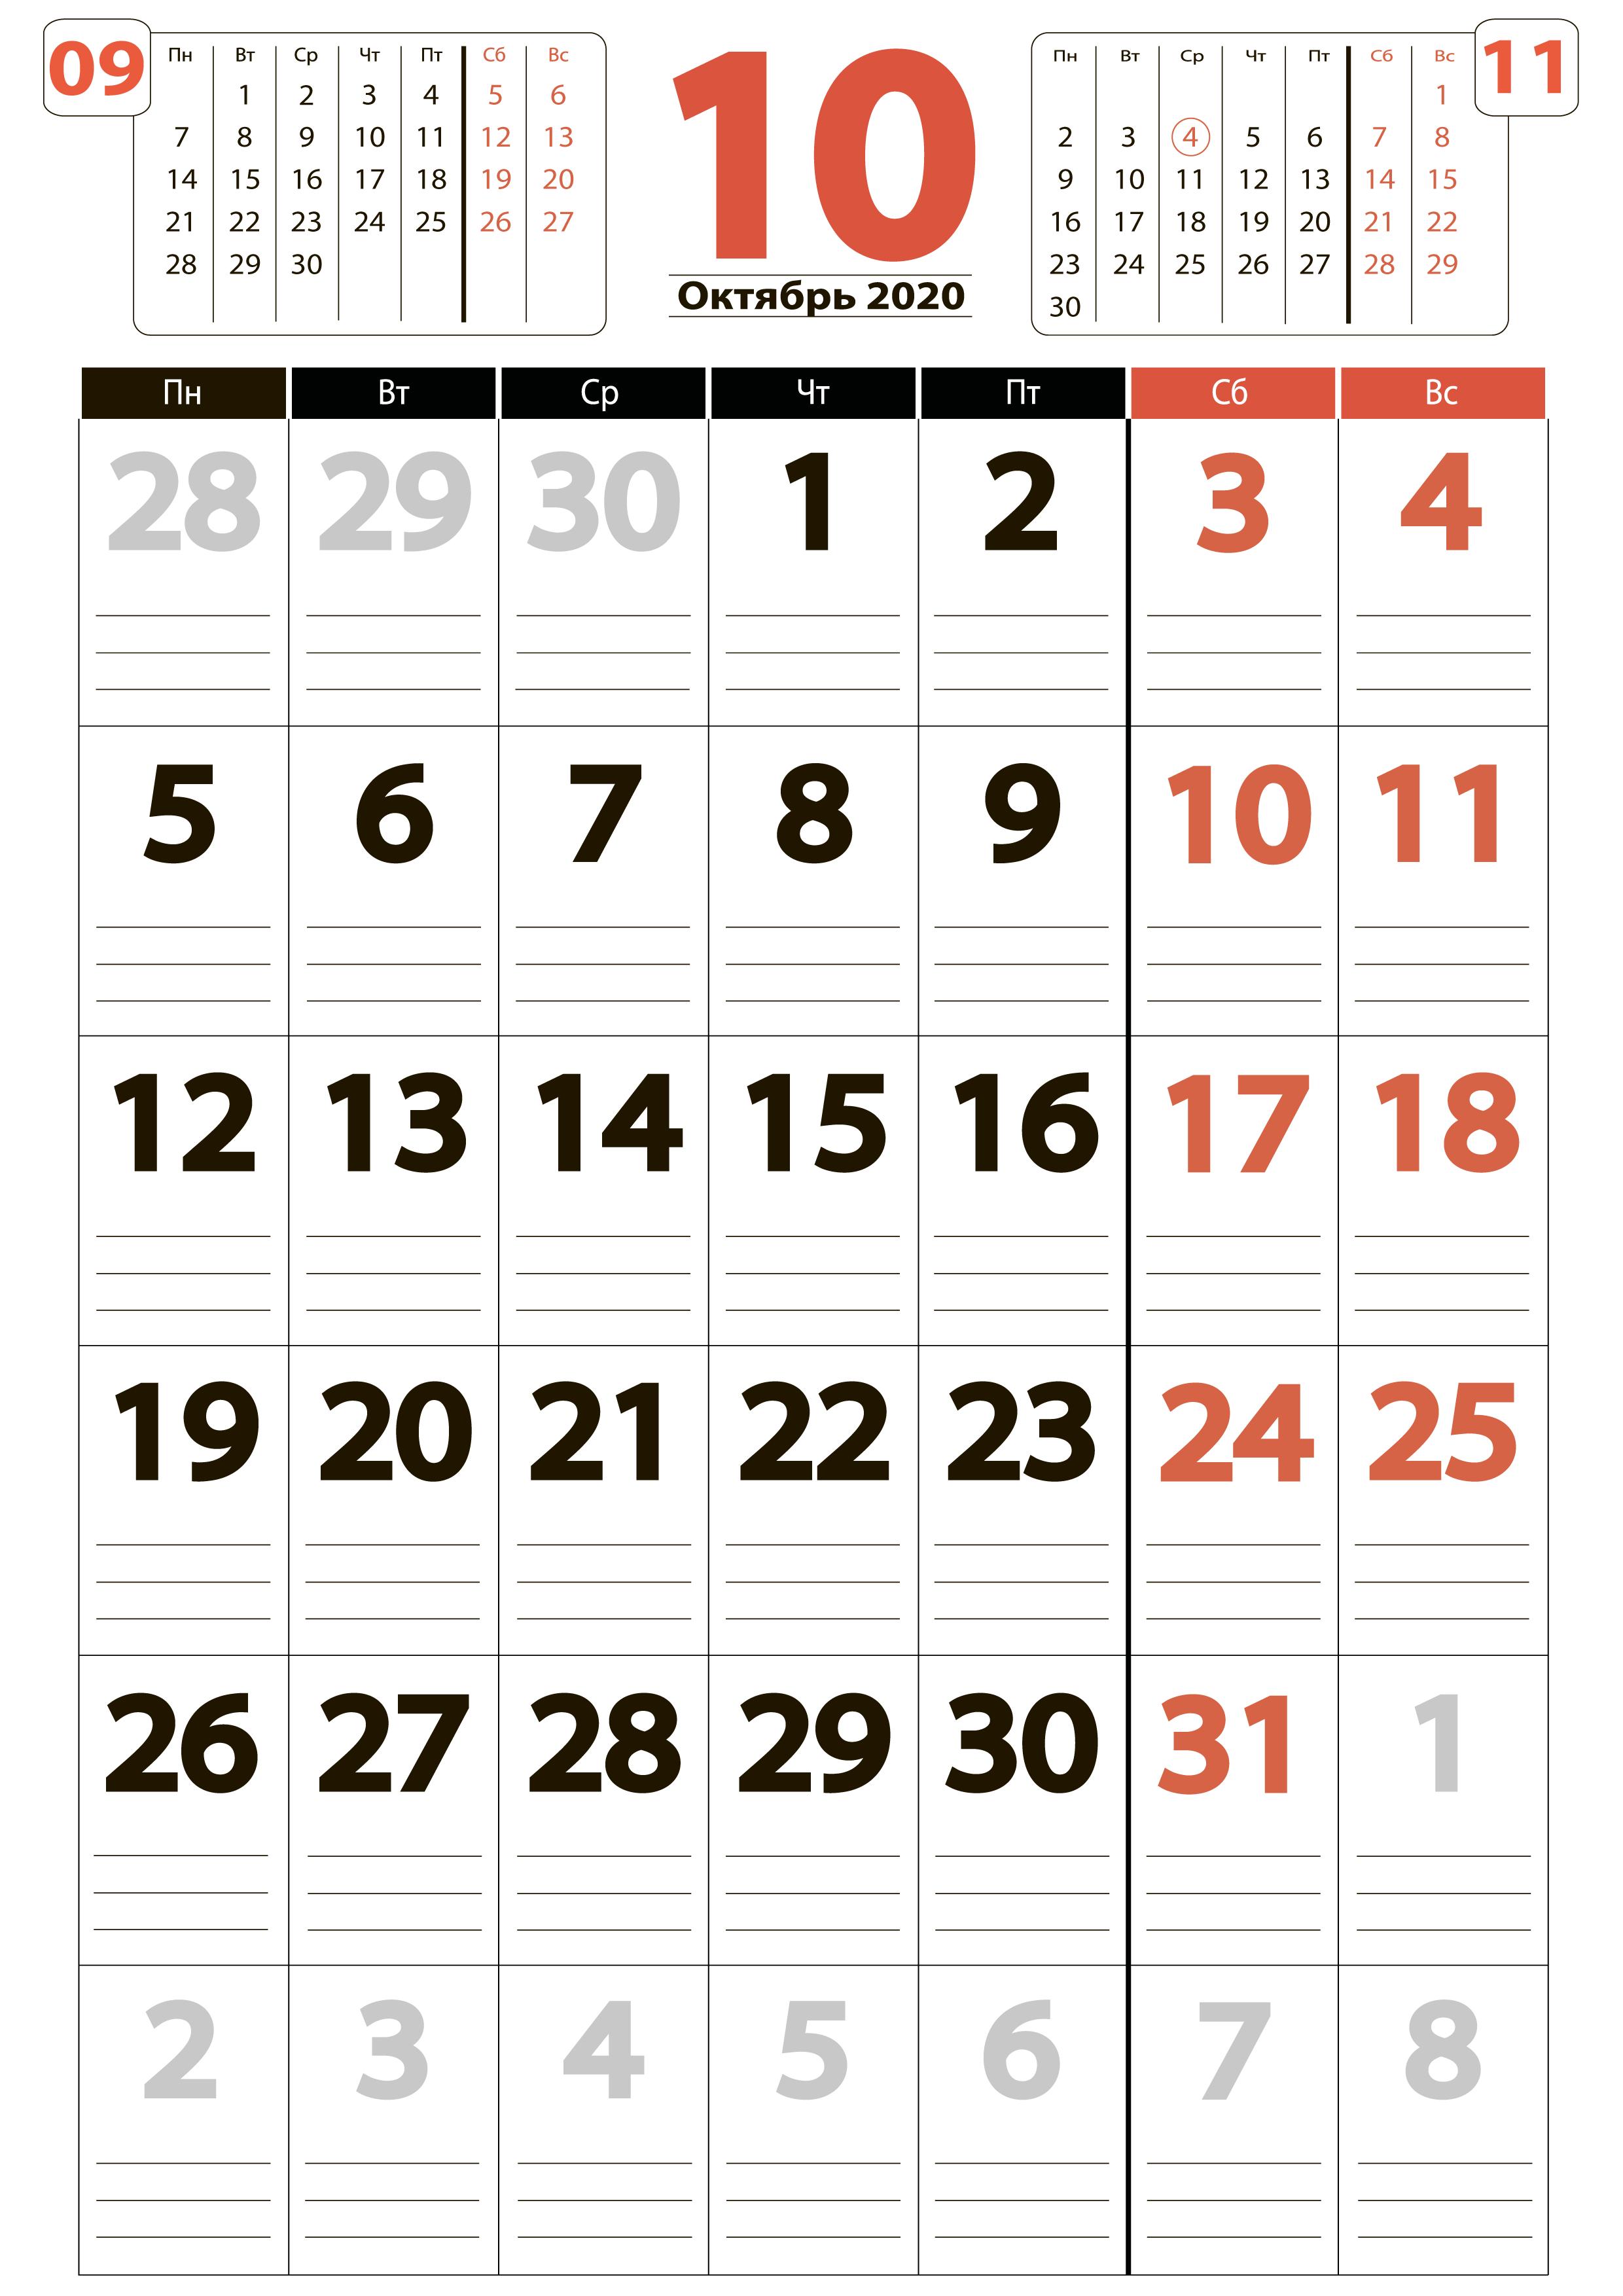 Октябрь 2020 - Крупный календарь на месяц